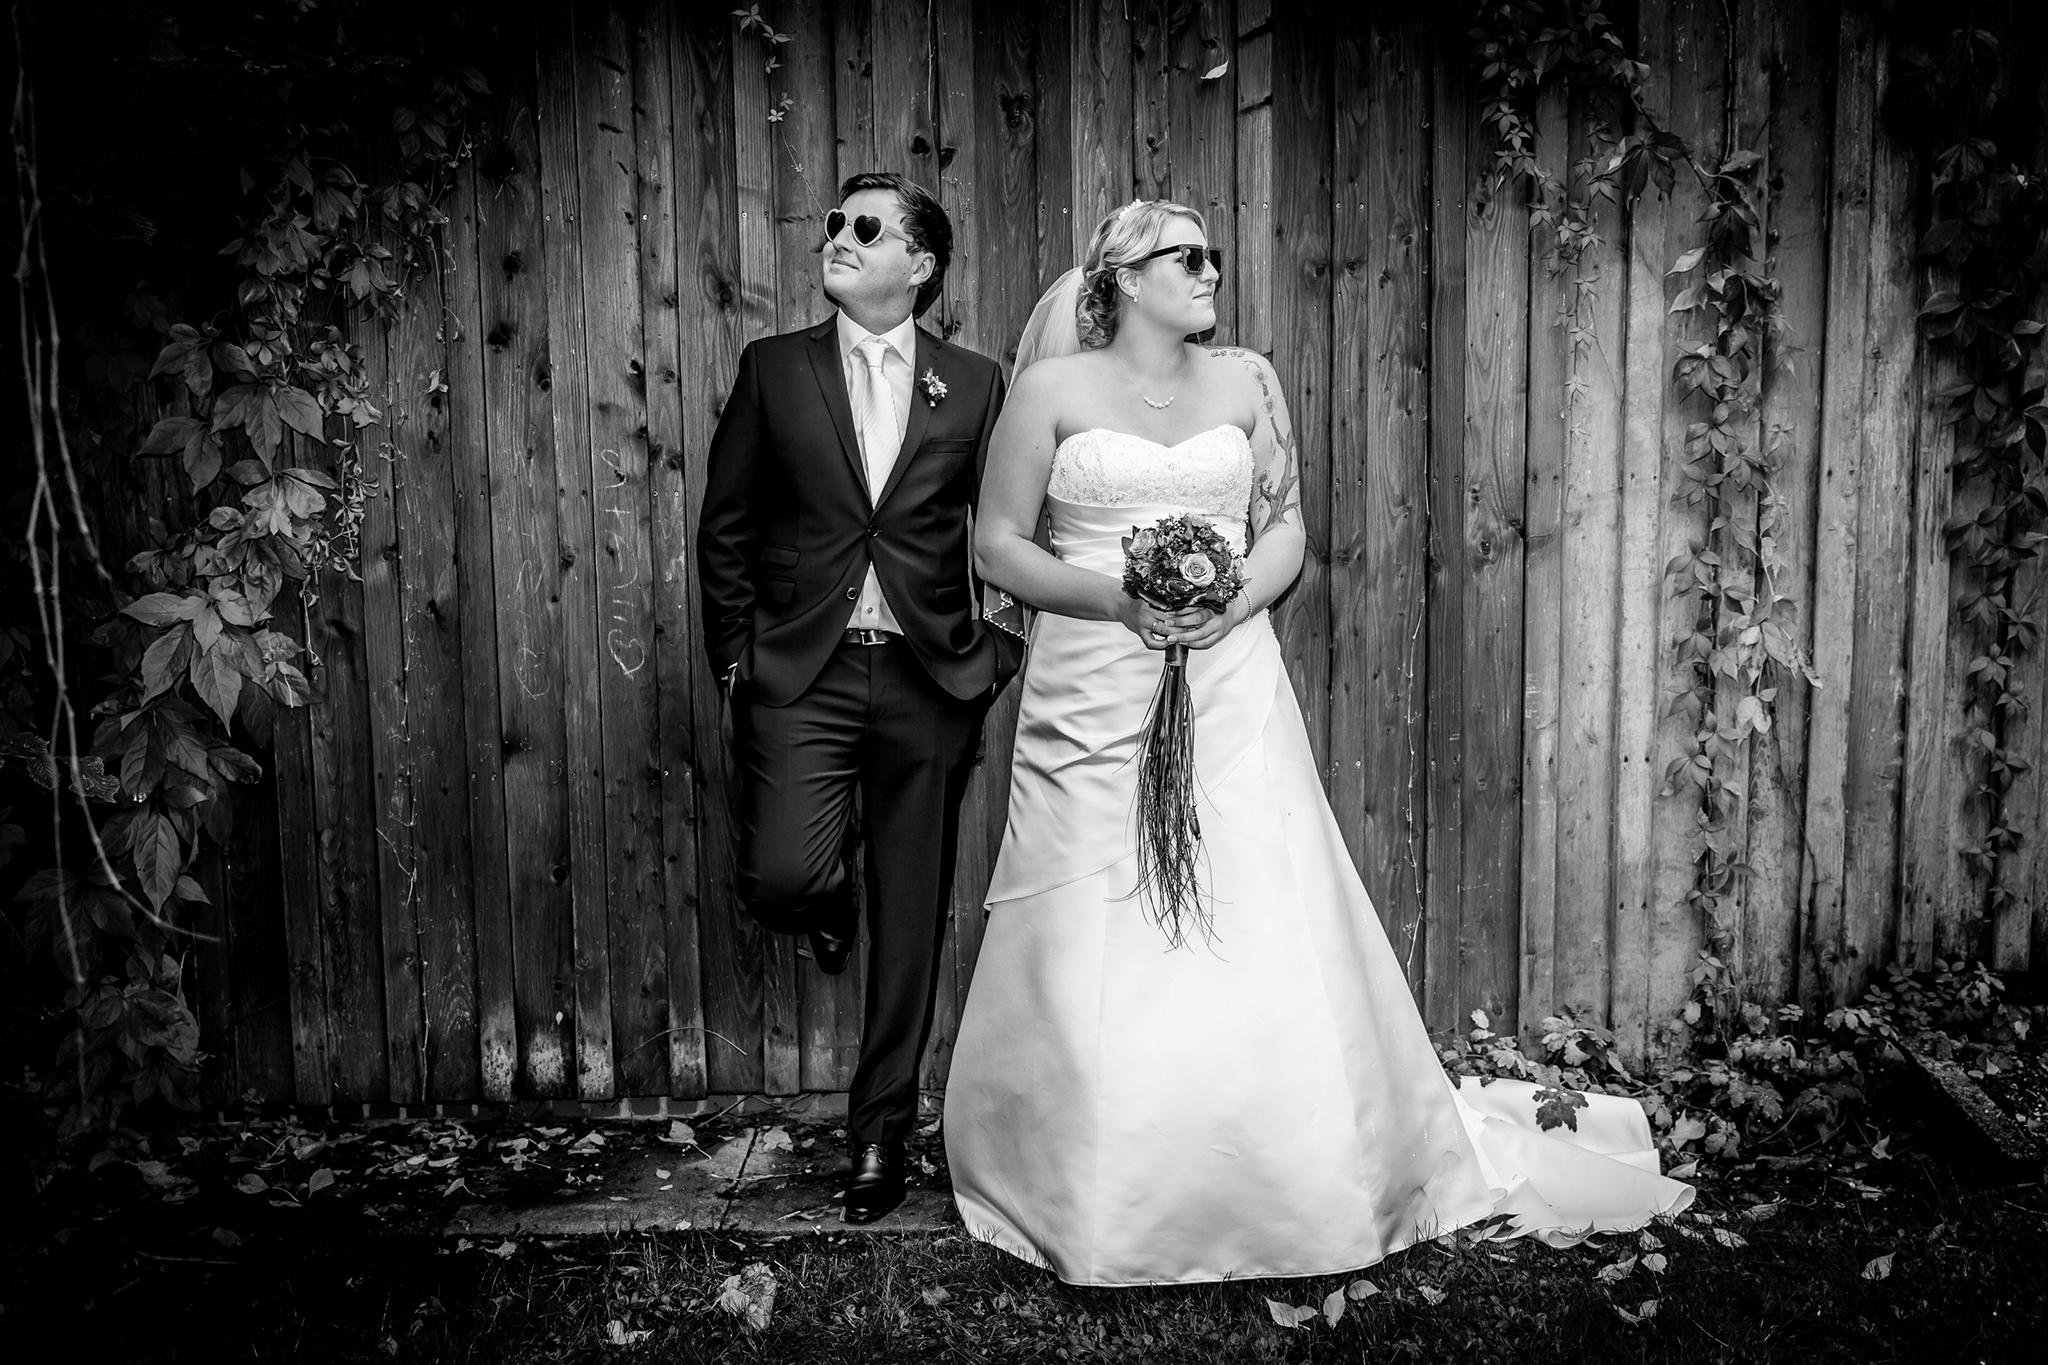 Sonke Rathje Hochzeitsfotograf Businessfotograf Portraitfotgraf